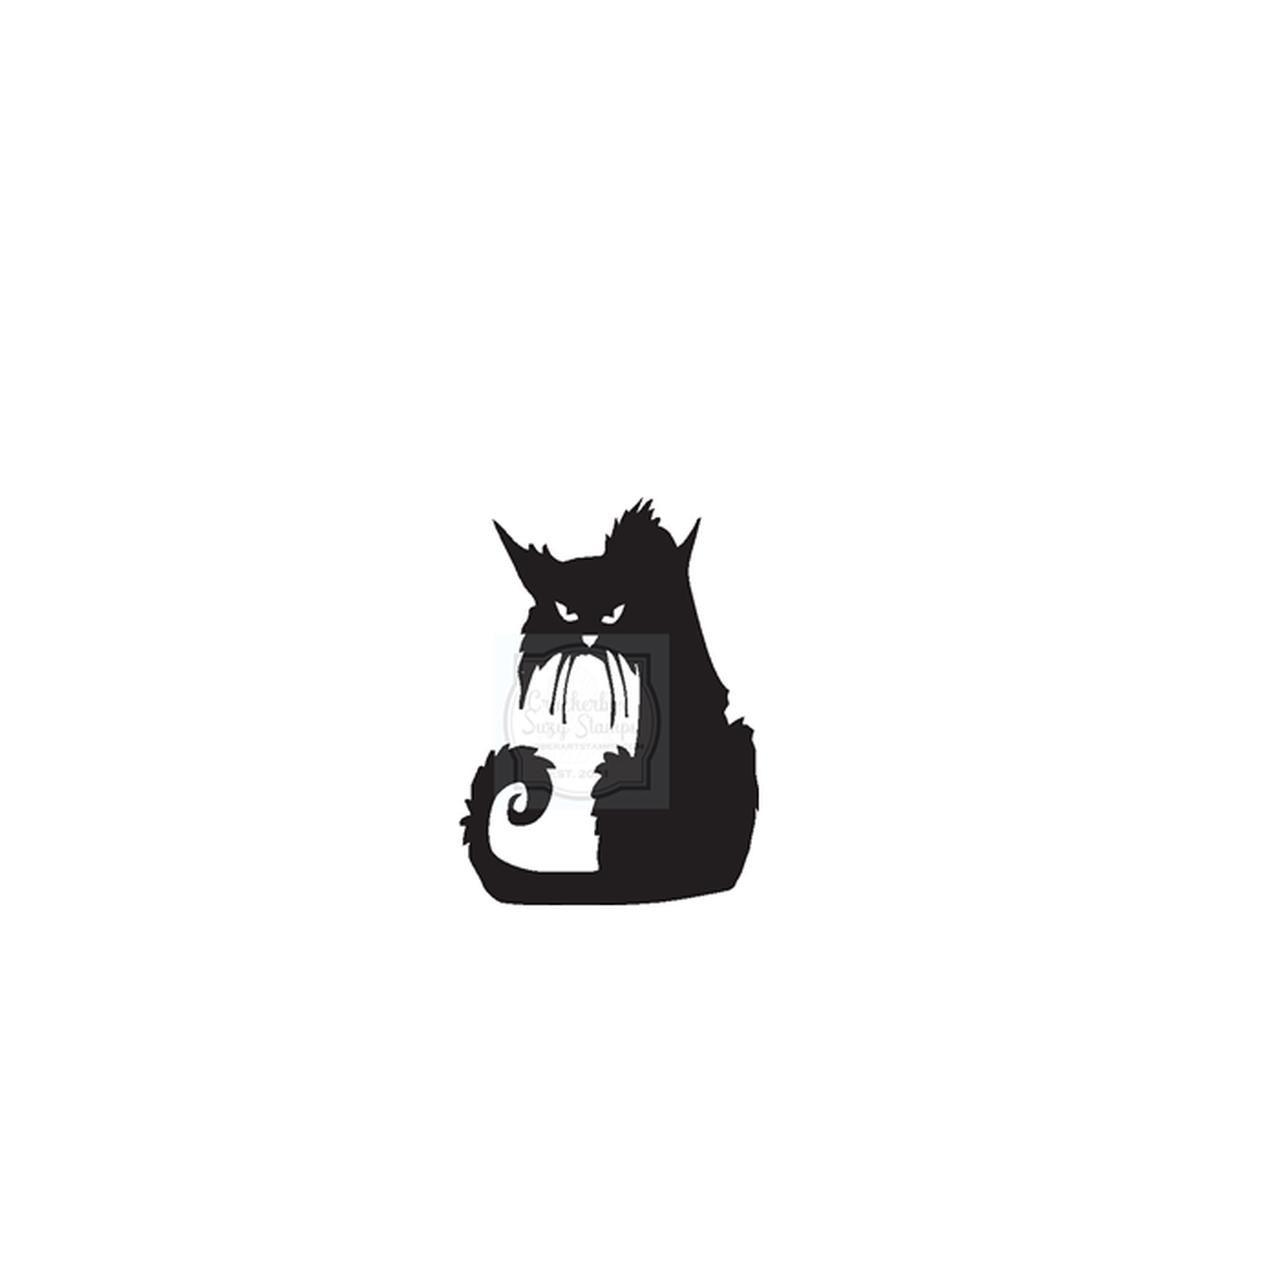 Crabby Cat Stamp